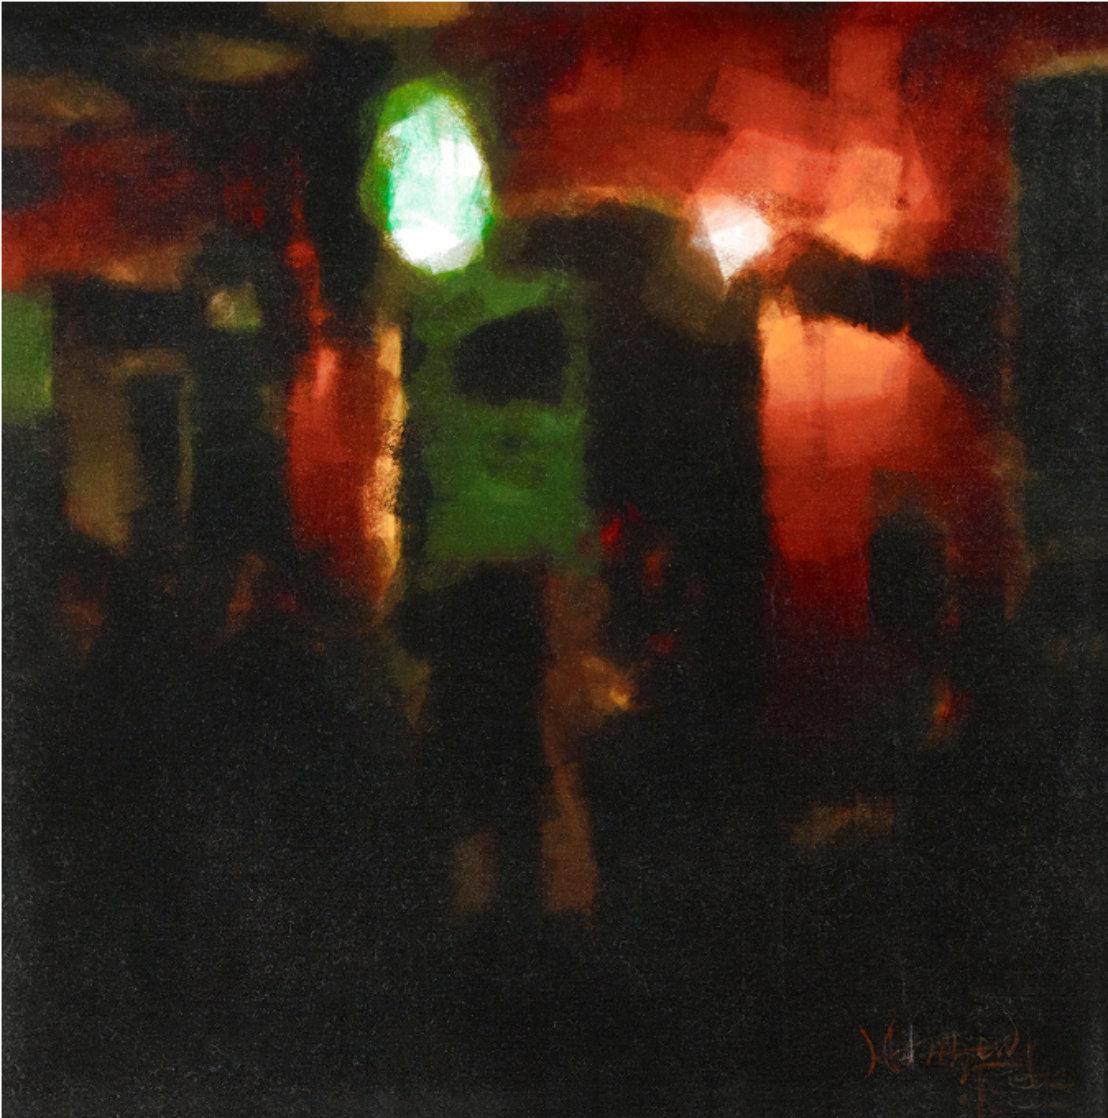 Pat O'Briens 2008 18x18 Original Painting by Matthew Peck